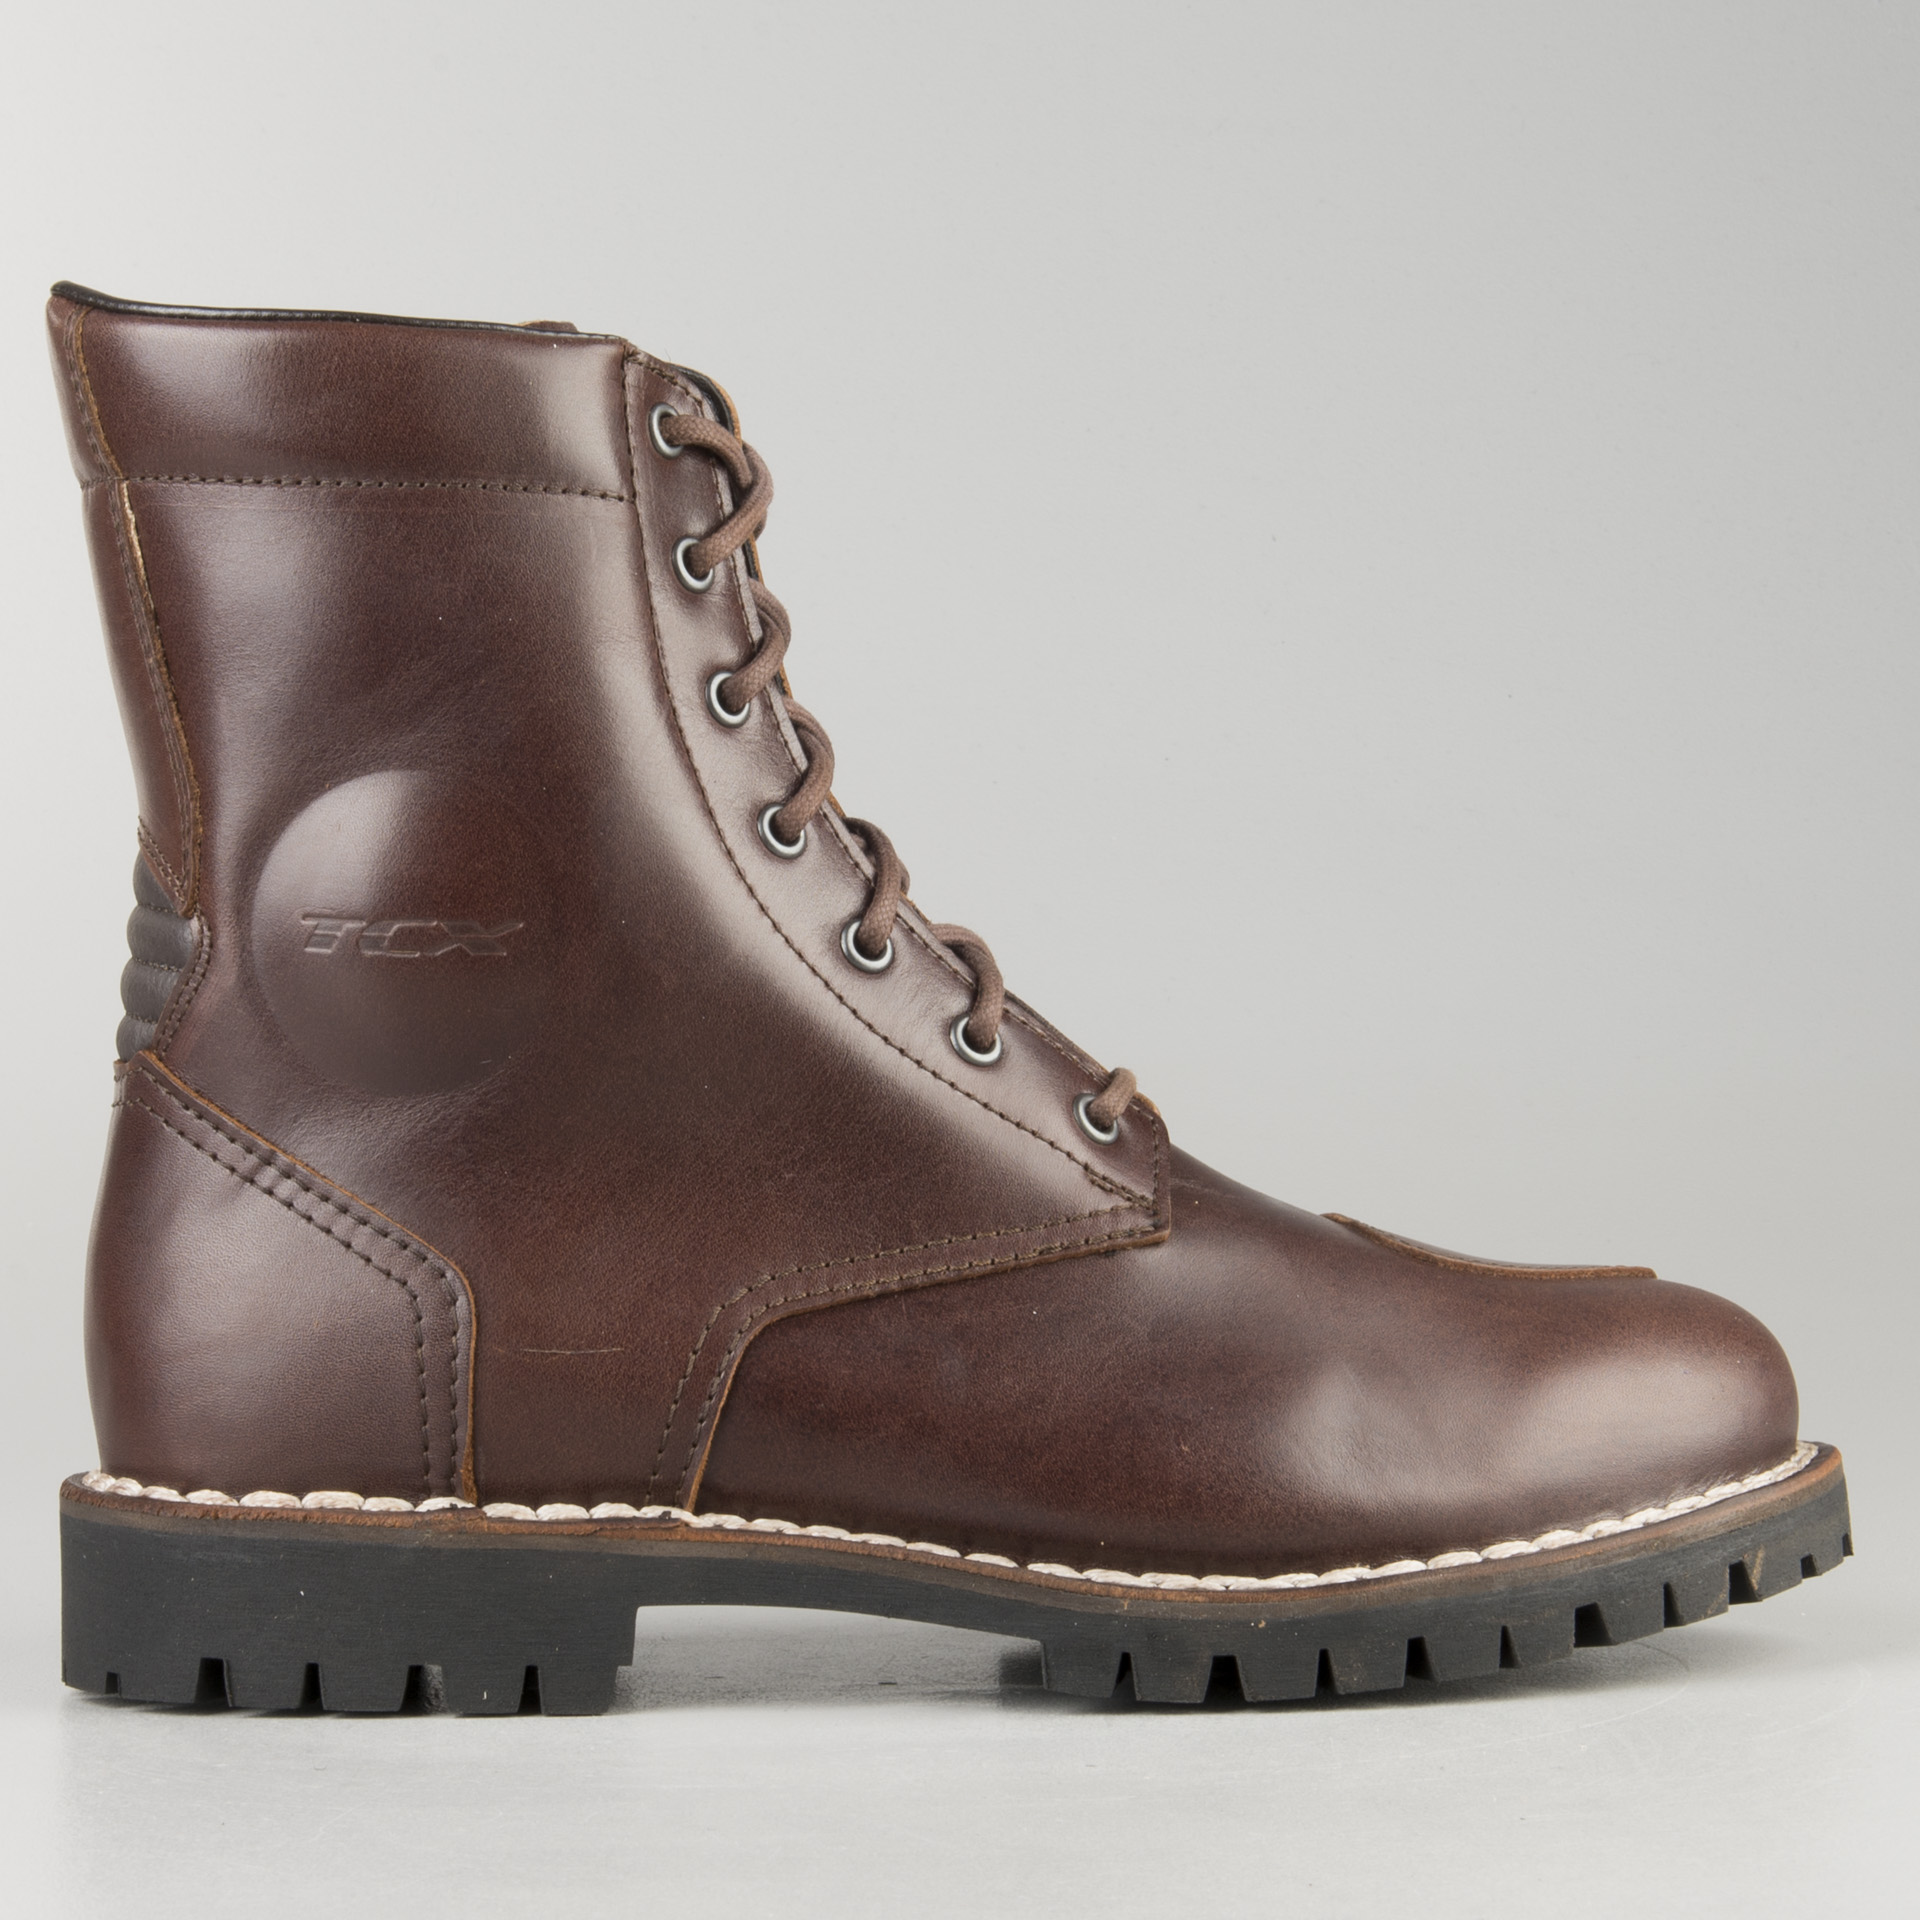 7b1 steel toe